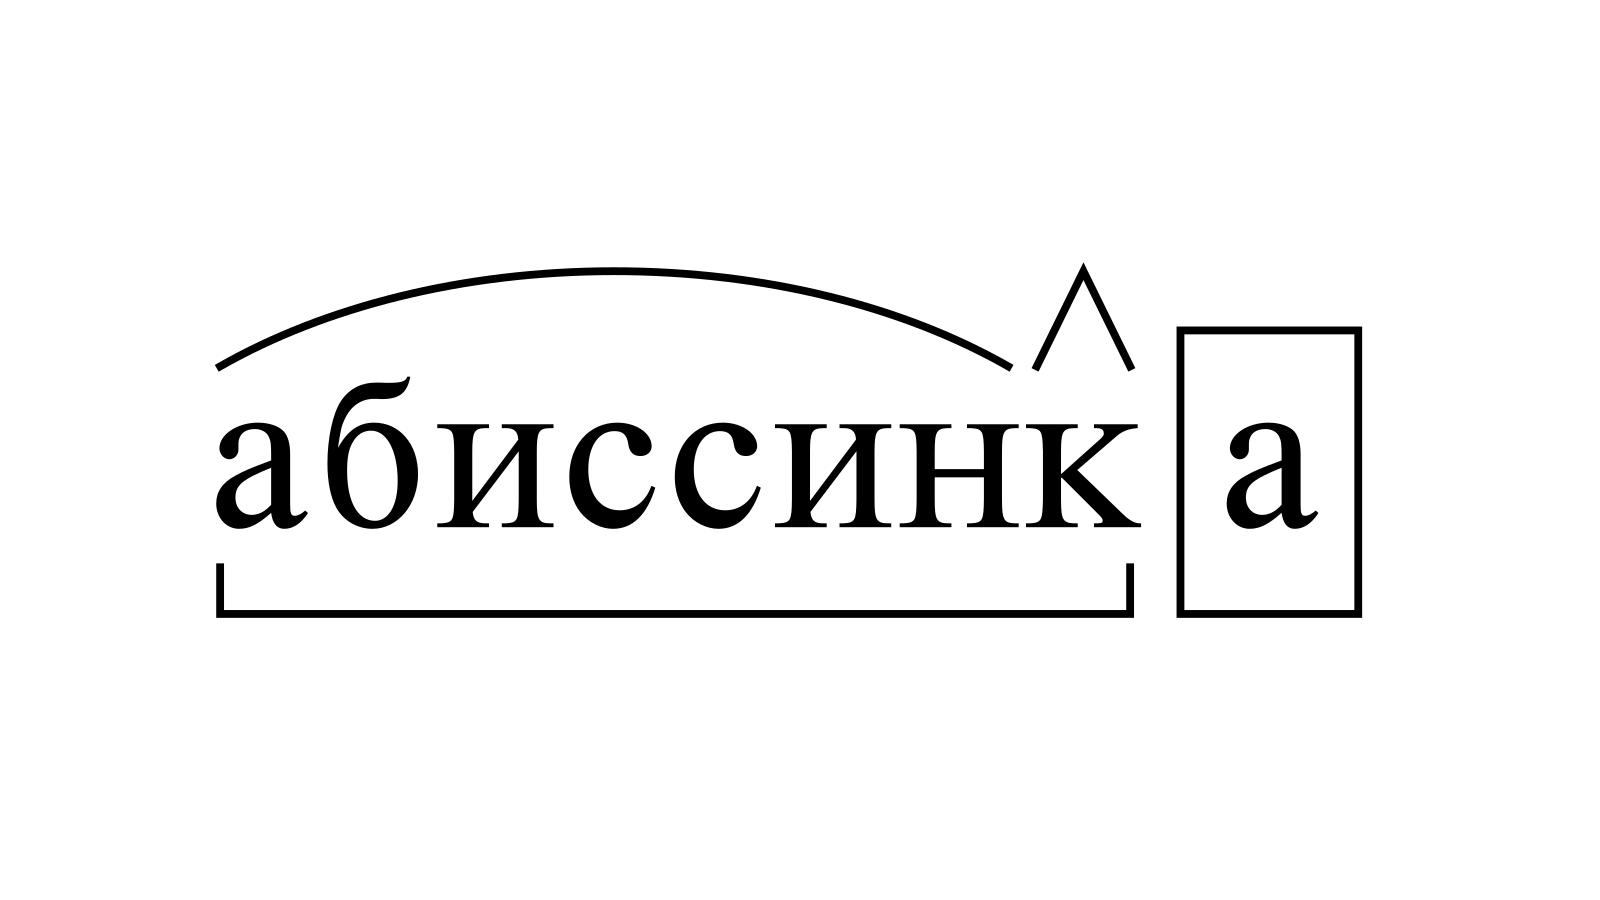 Разбор слова «абиссинка» по составу